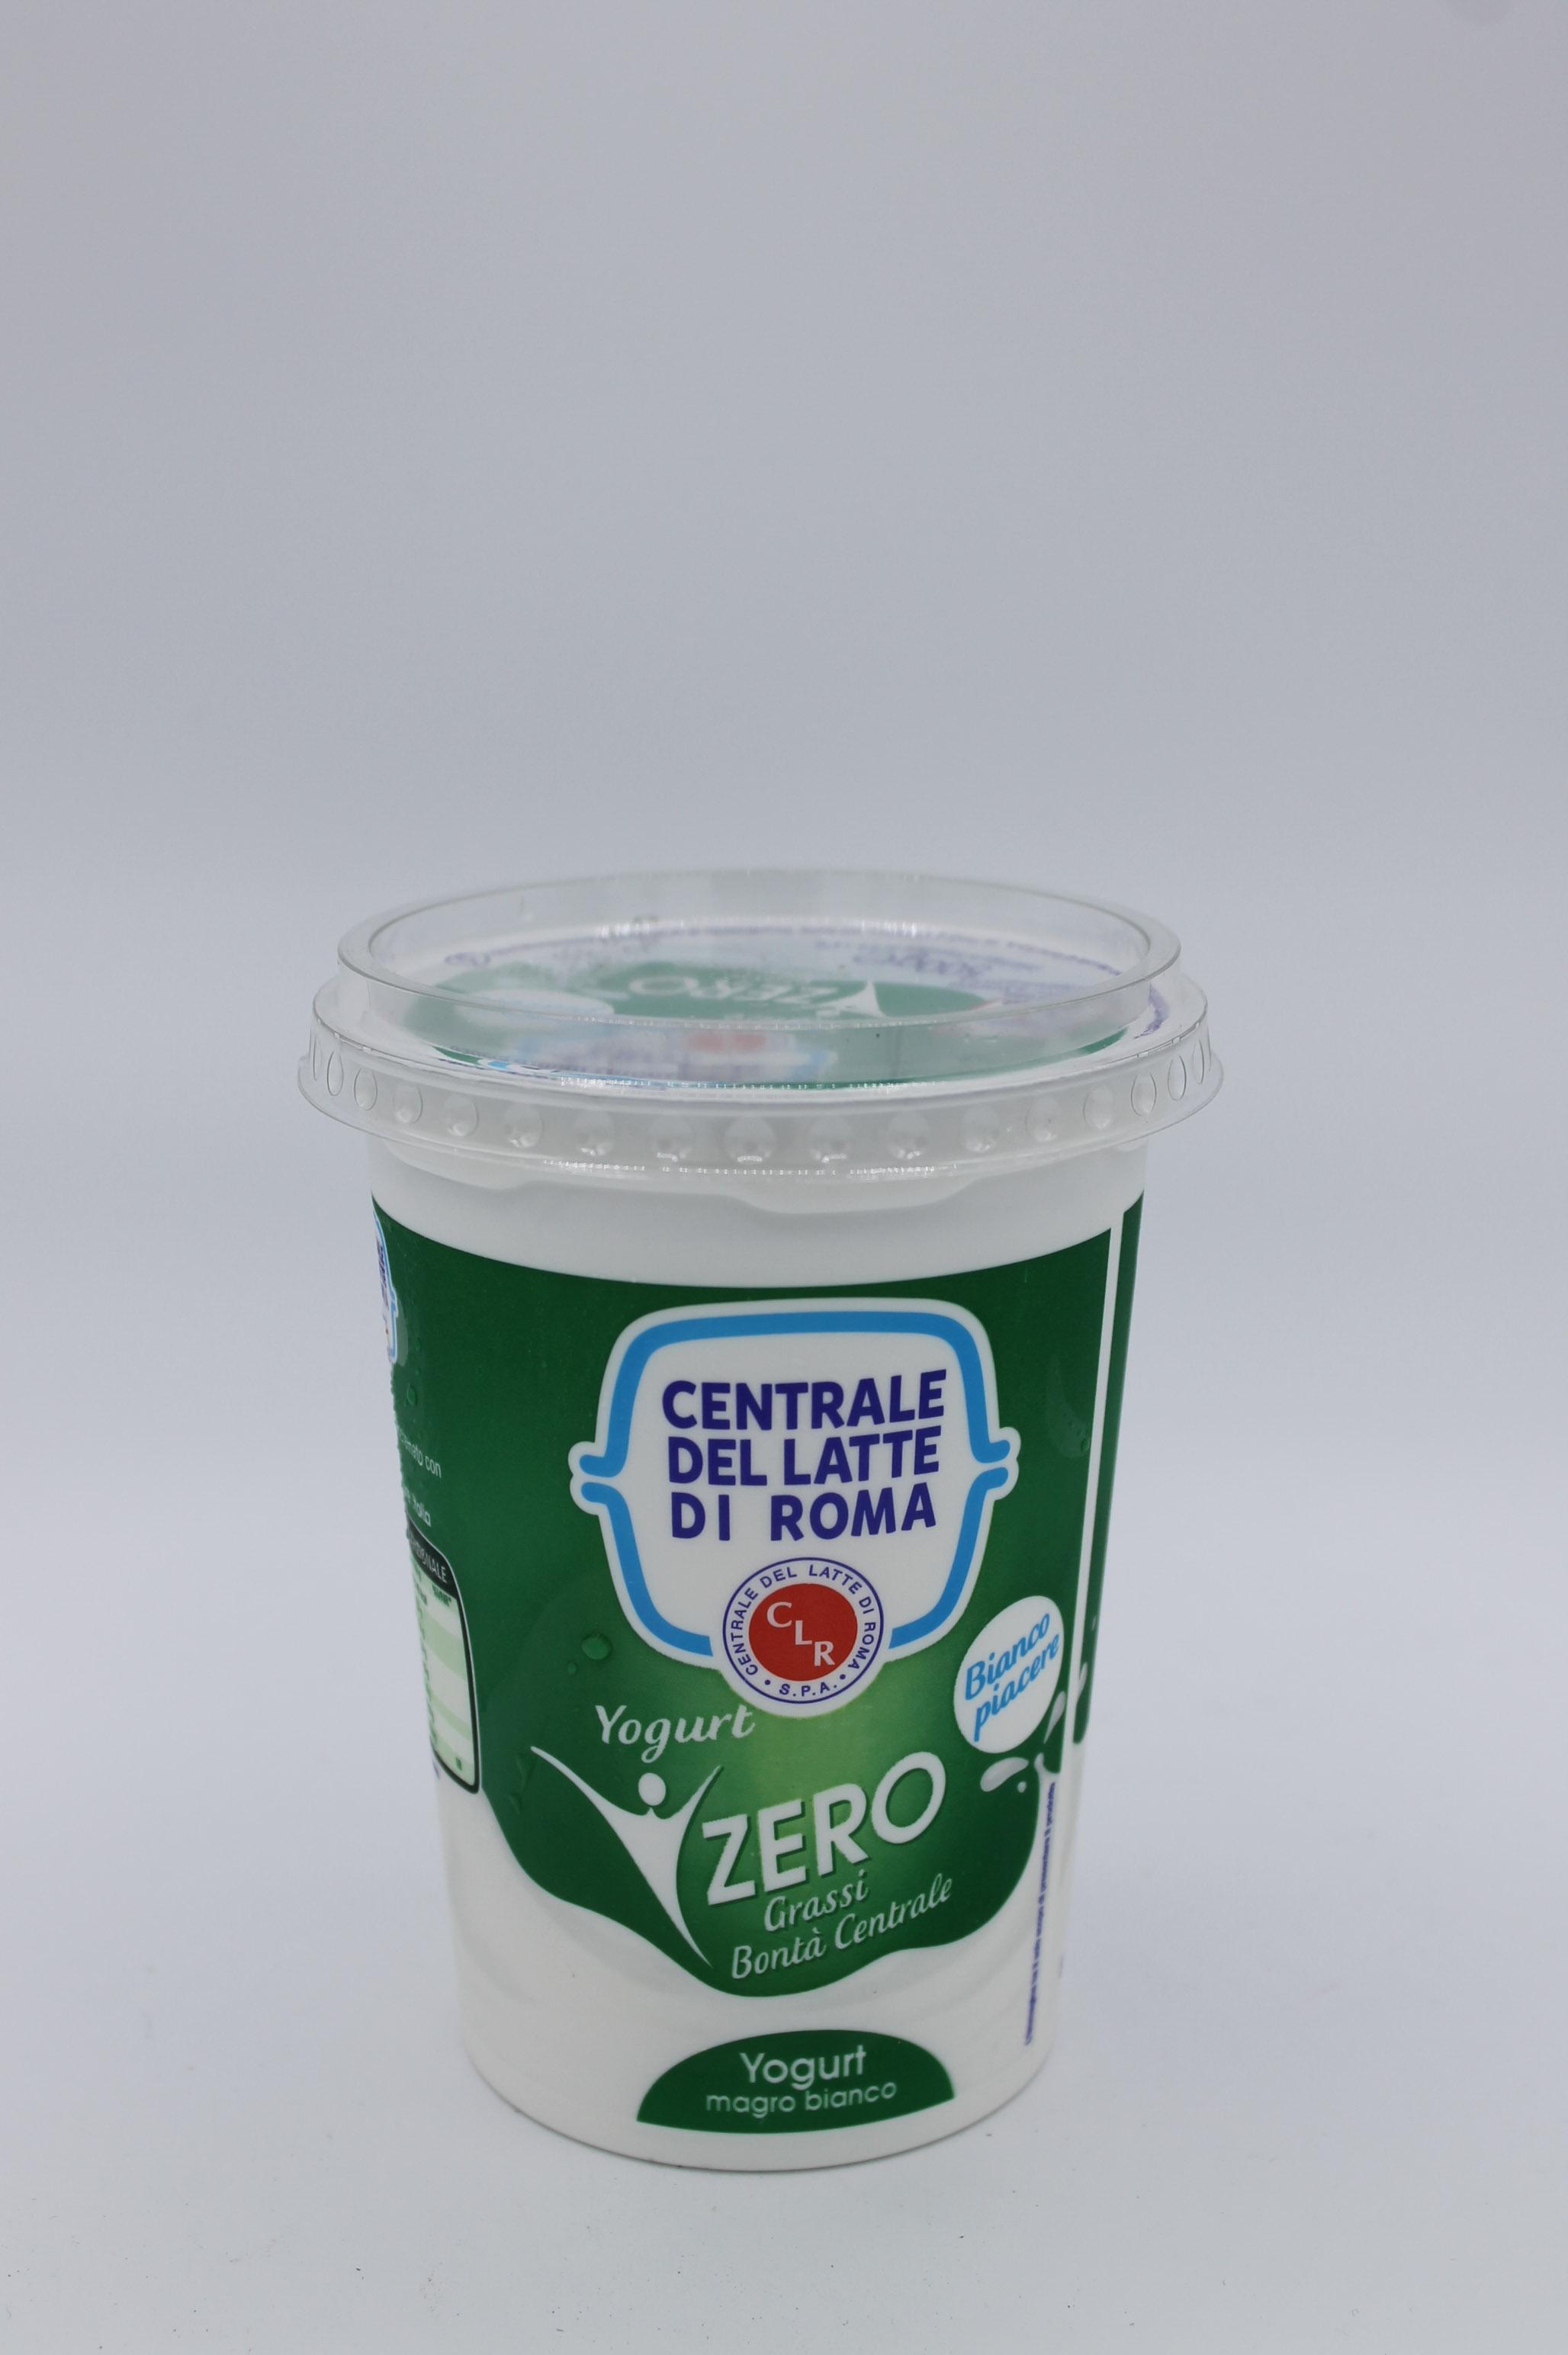 Centrale del latte yogurt magro bianco 500gr.